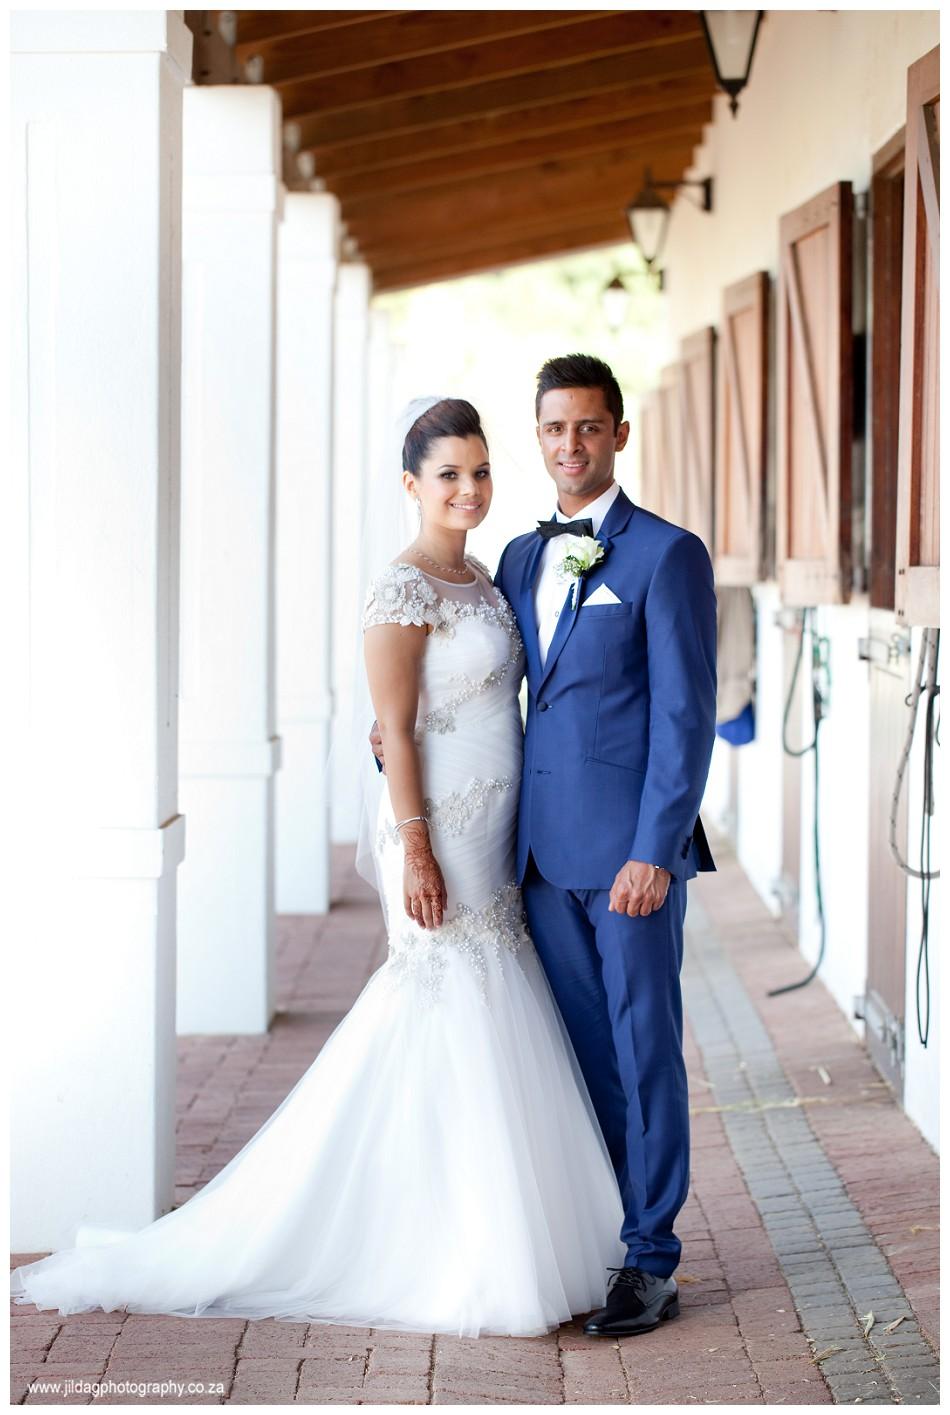 Muslim wedding - Val De Vie - Jilda G Photography (62)